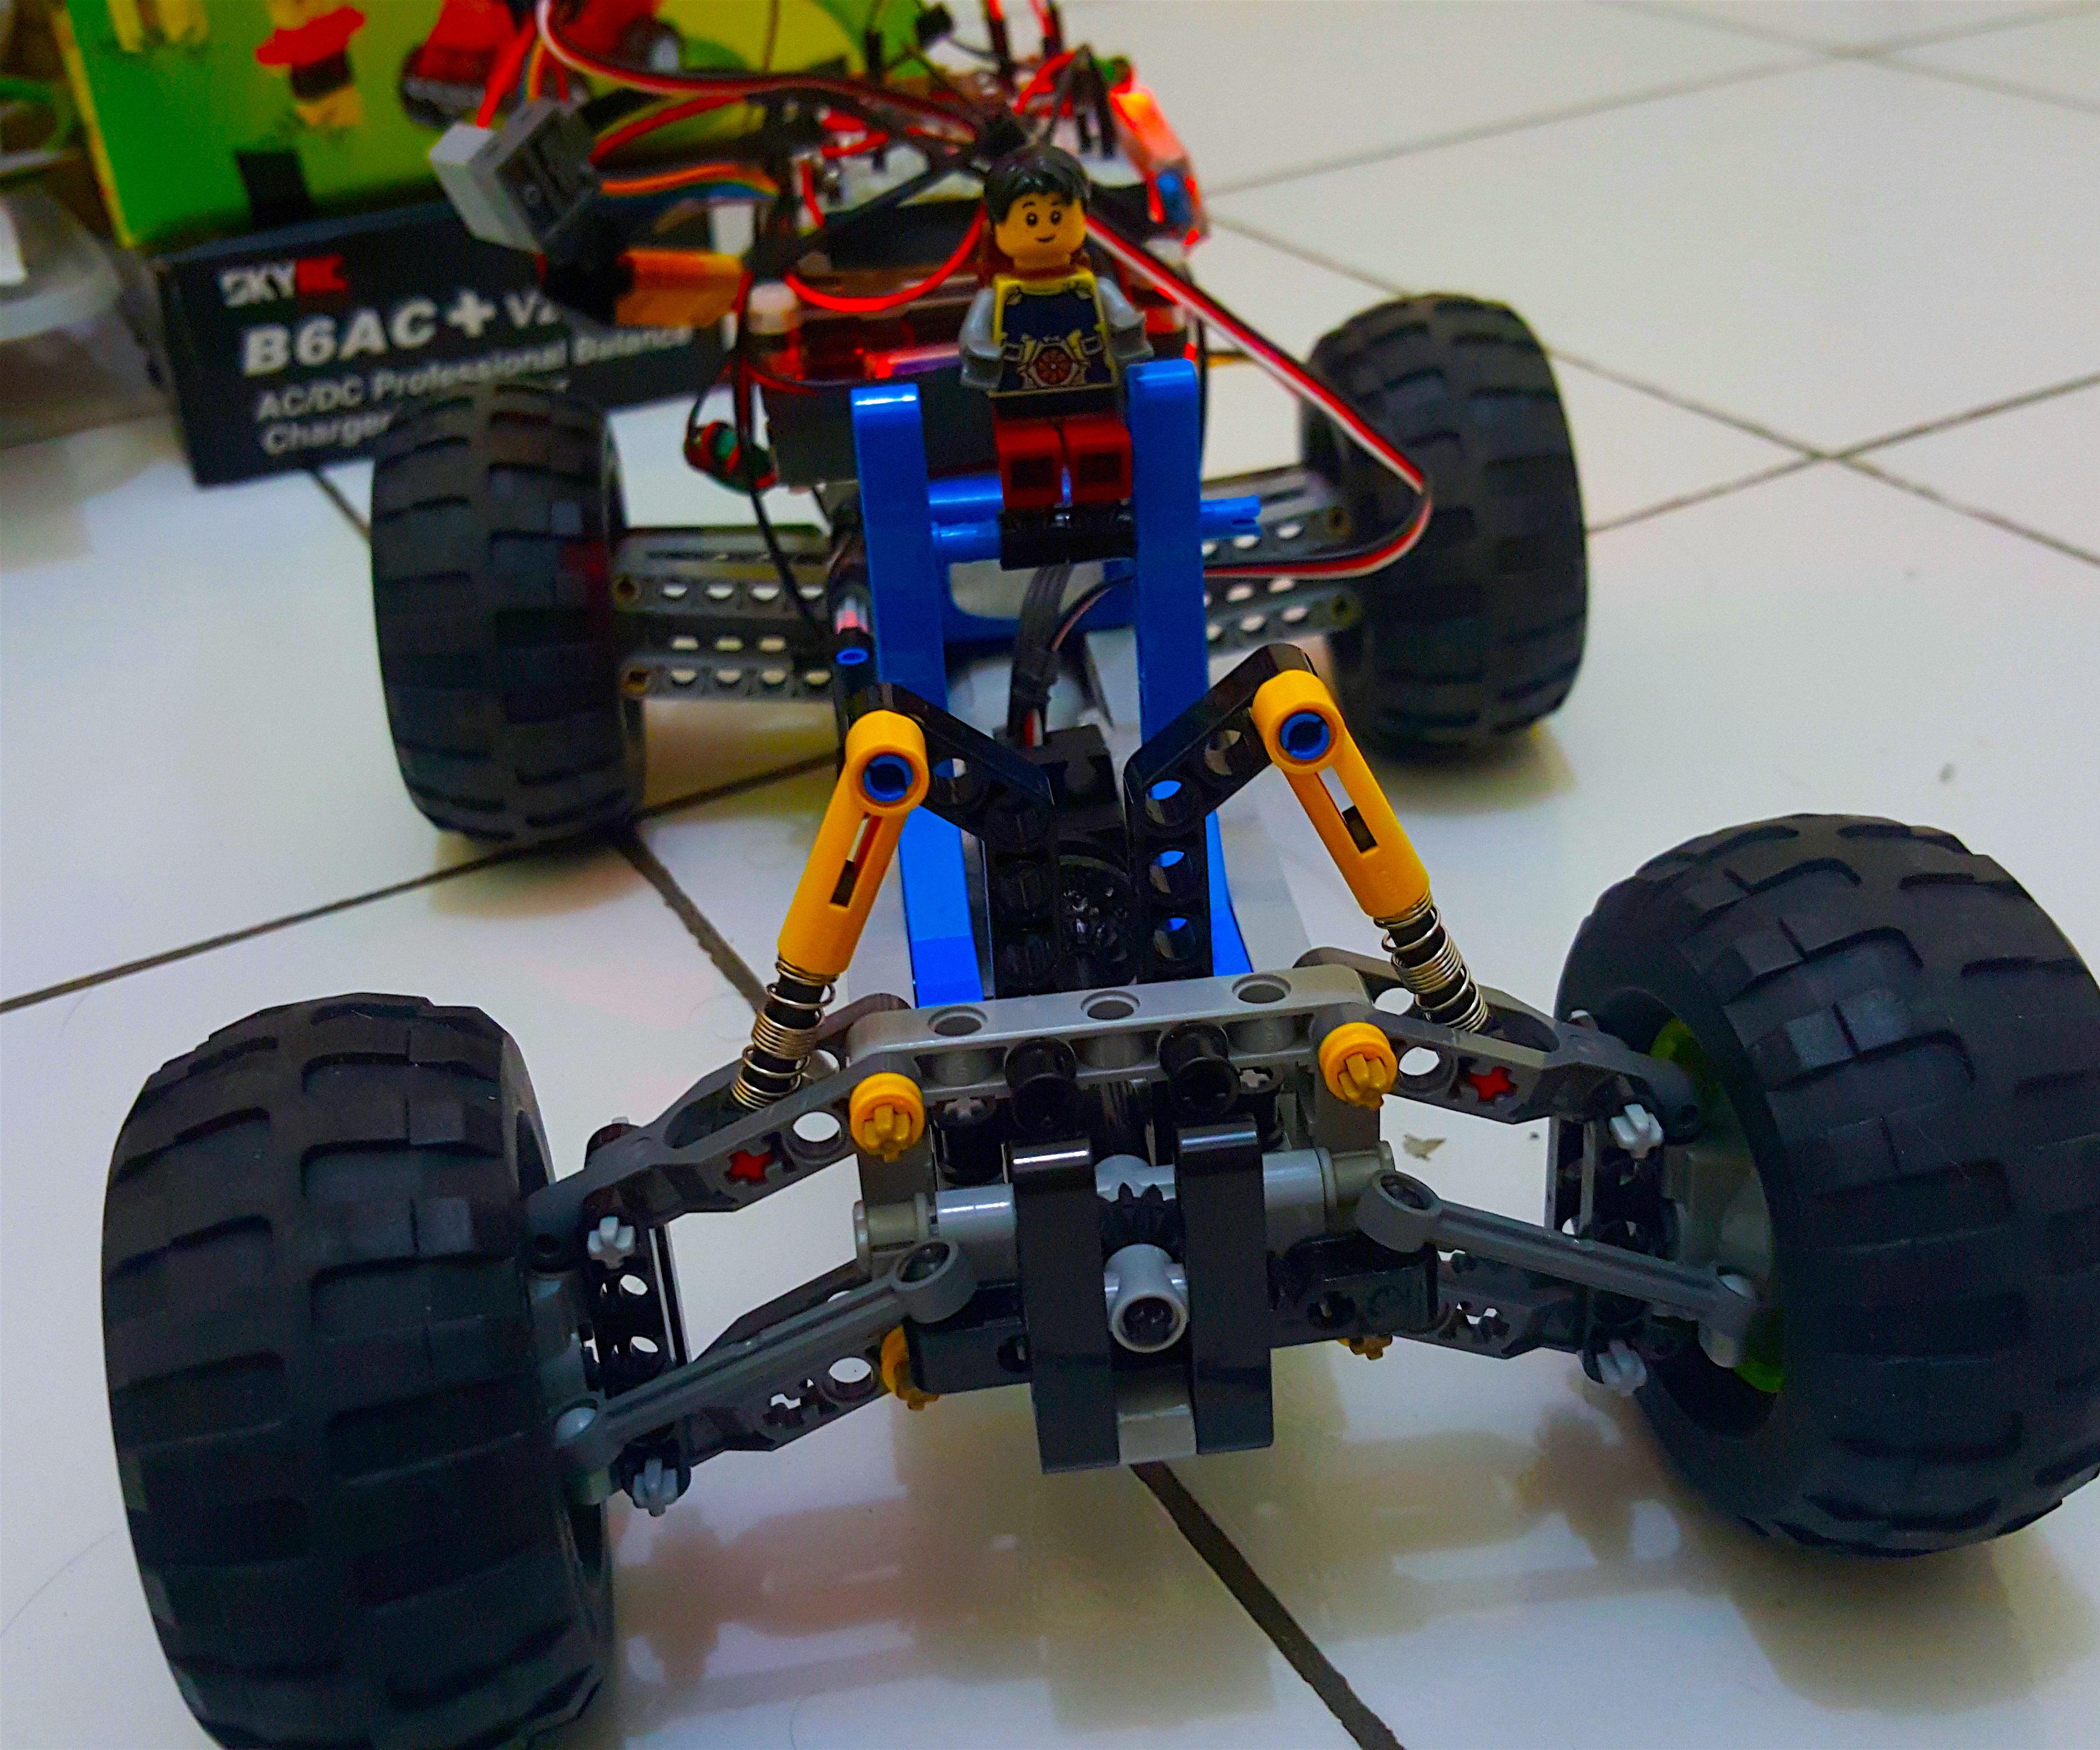 DIY - Control Off-road Lego Car Through Internet (IoT) - Part 2